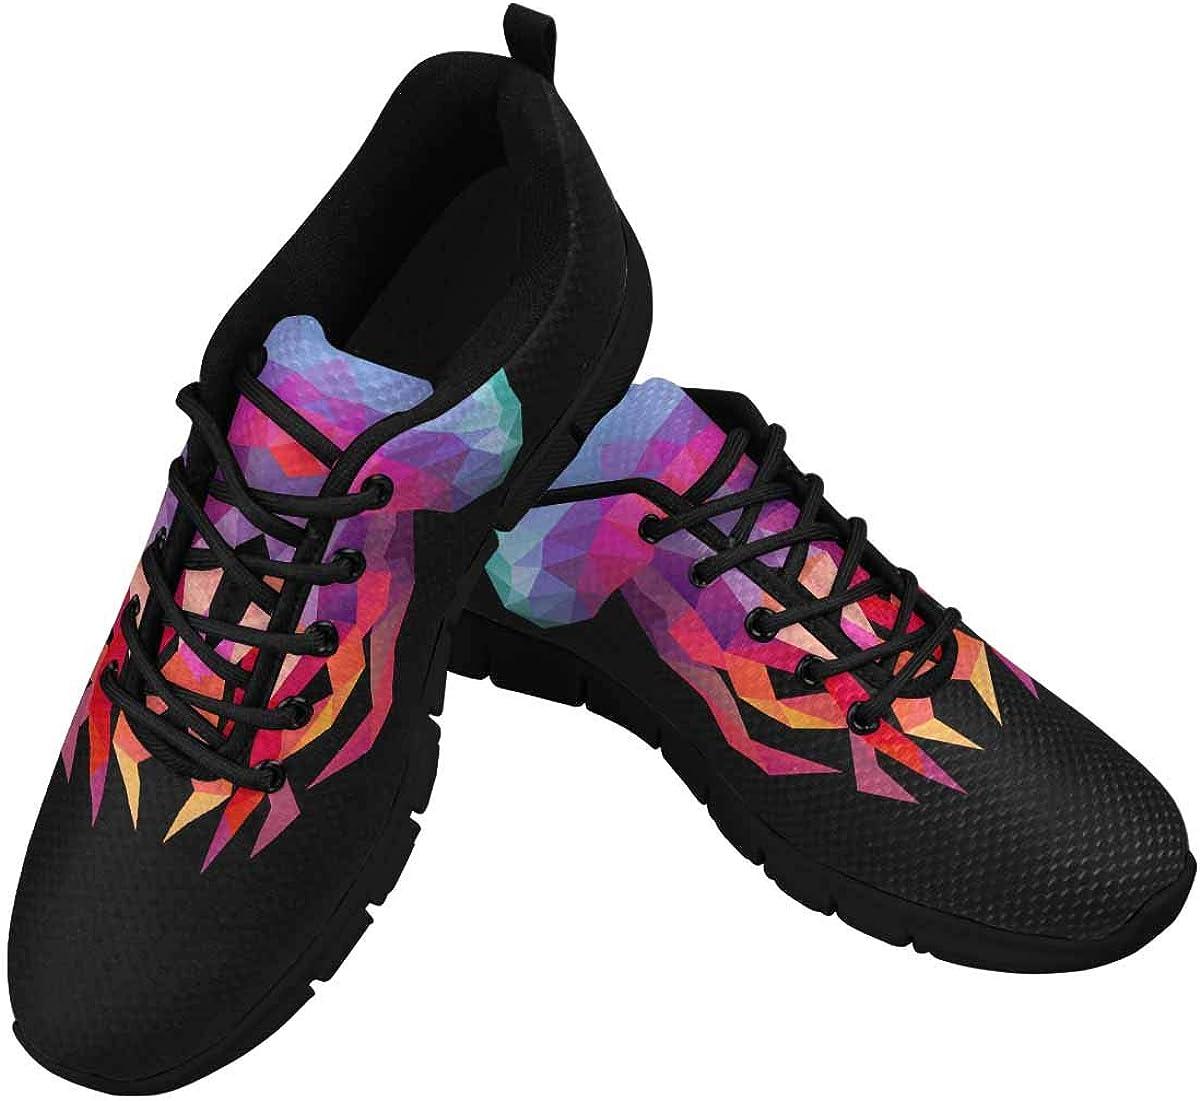 InterestPrint Abstract Jellyfish Women's Athletic Walking Shoes Breathe Comfort Mesh